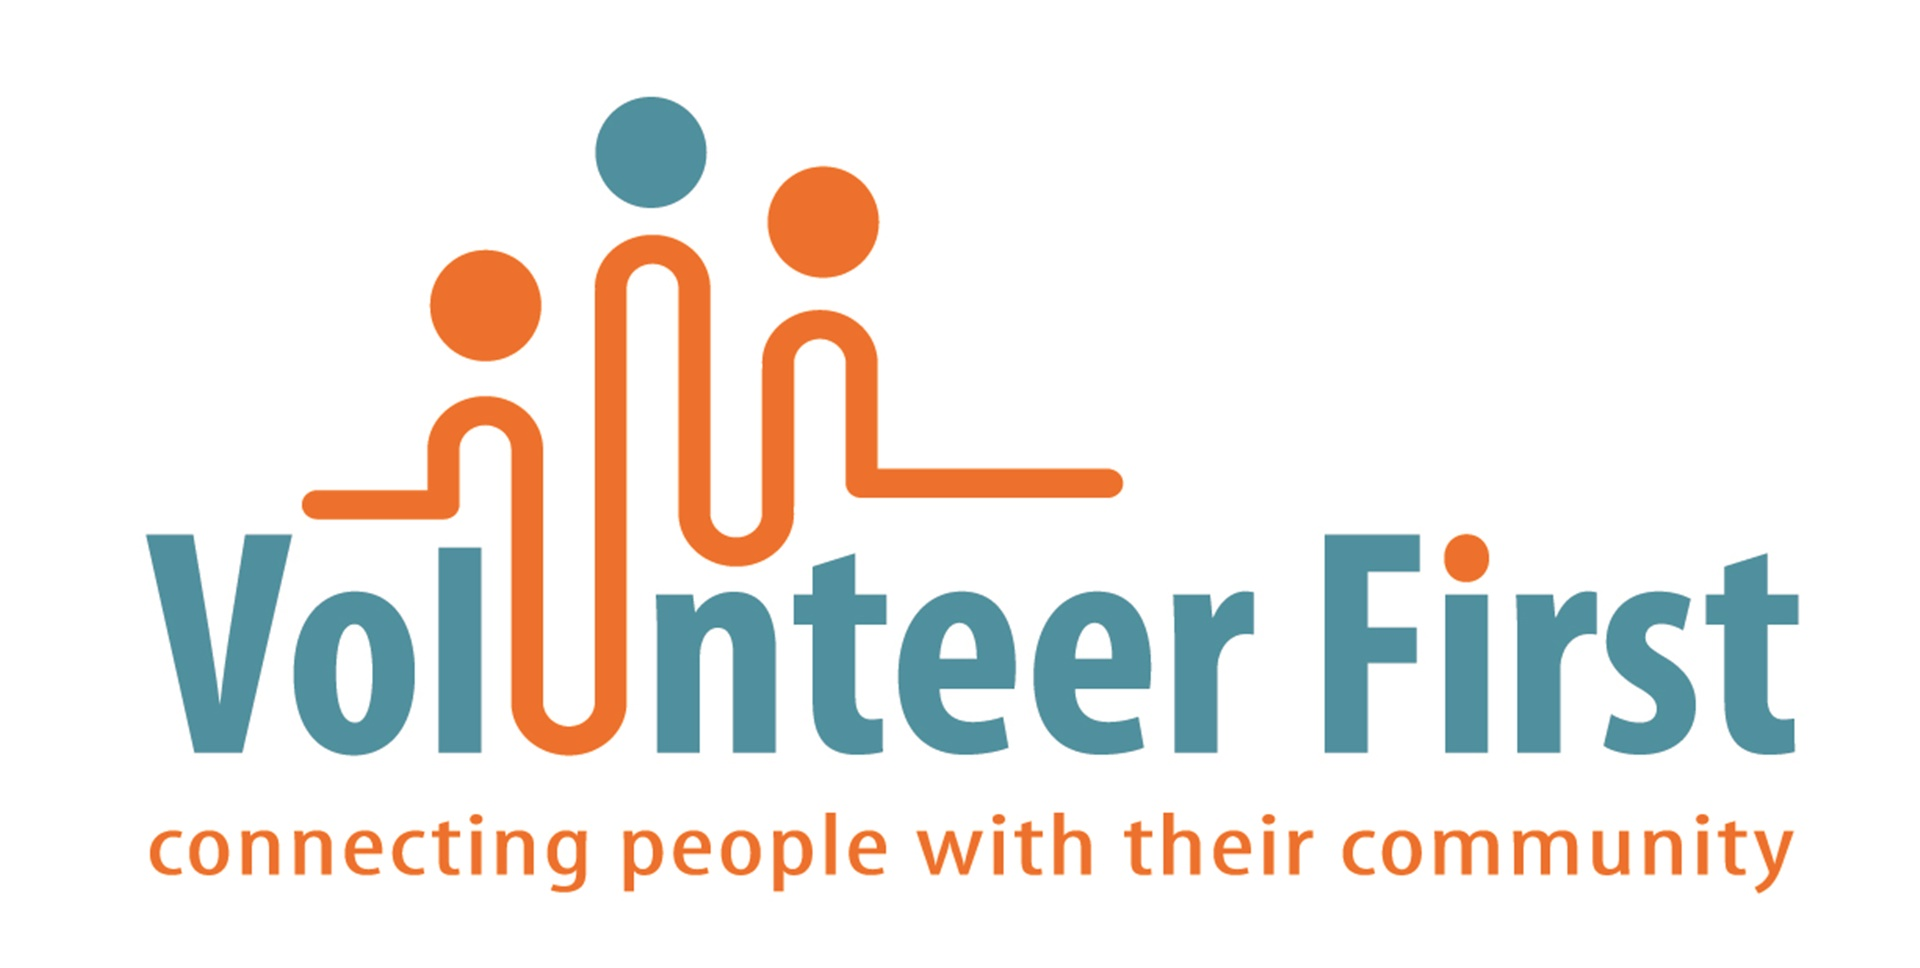 Volunteering first